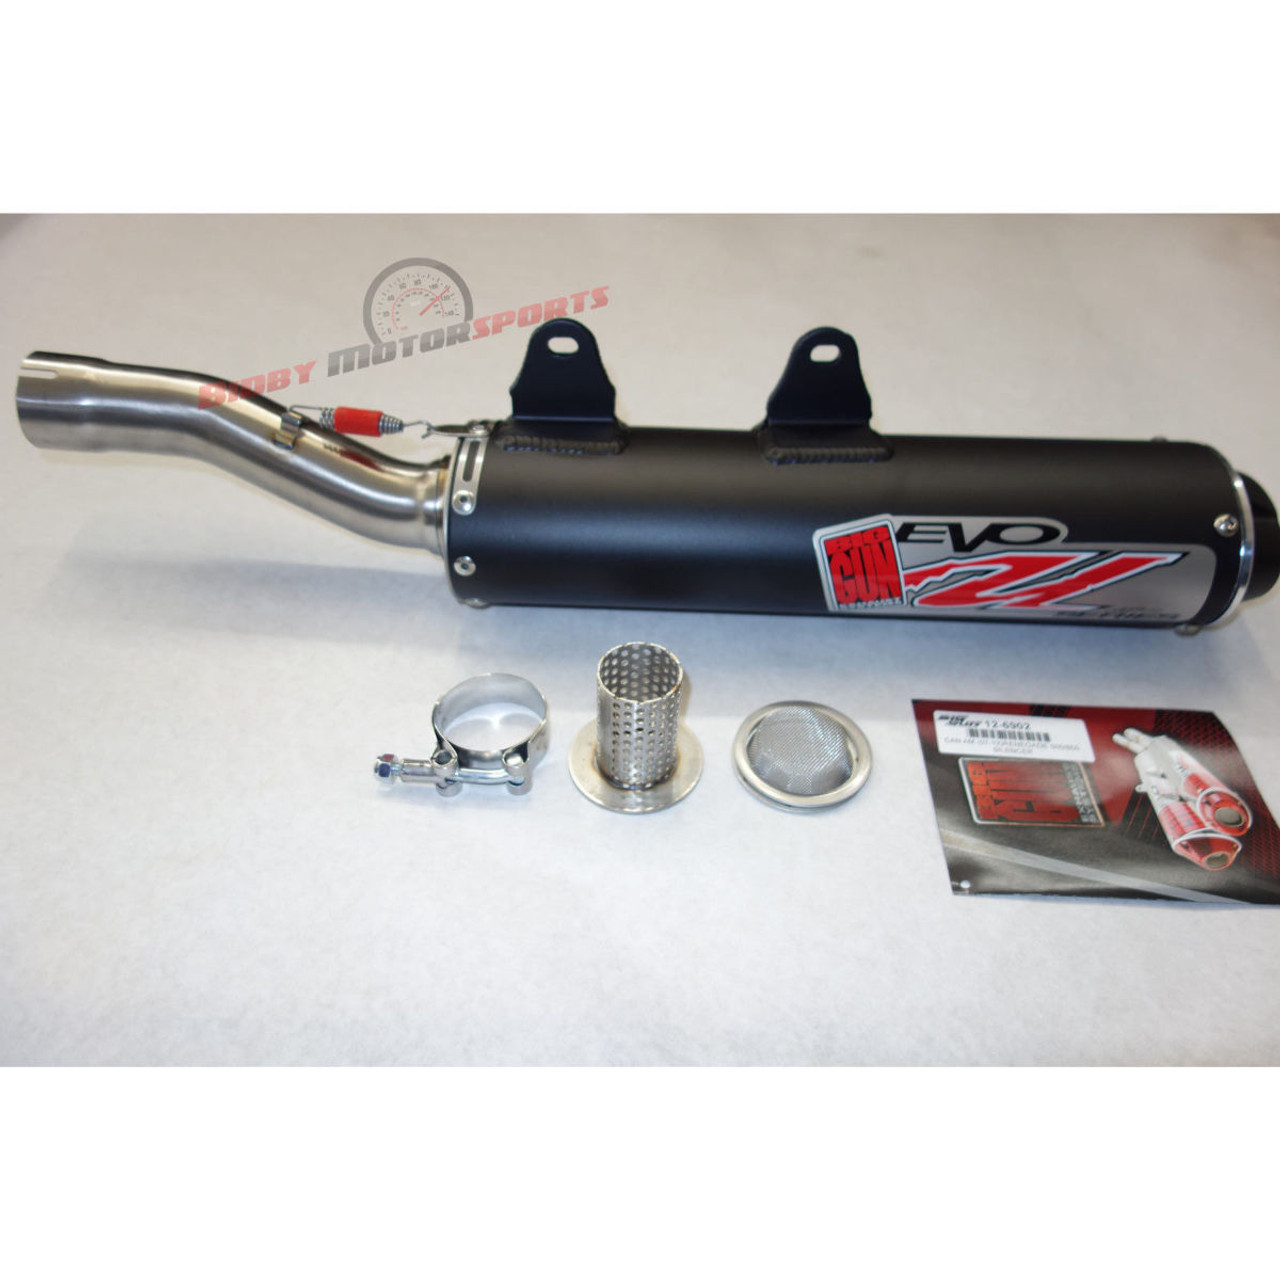 Big Gun Evo U Exhaust Slip-On Muffler CanAm Renegade 500 800 800r 800xxc  12-6902